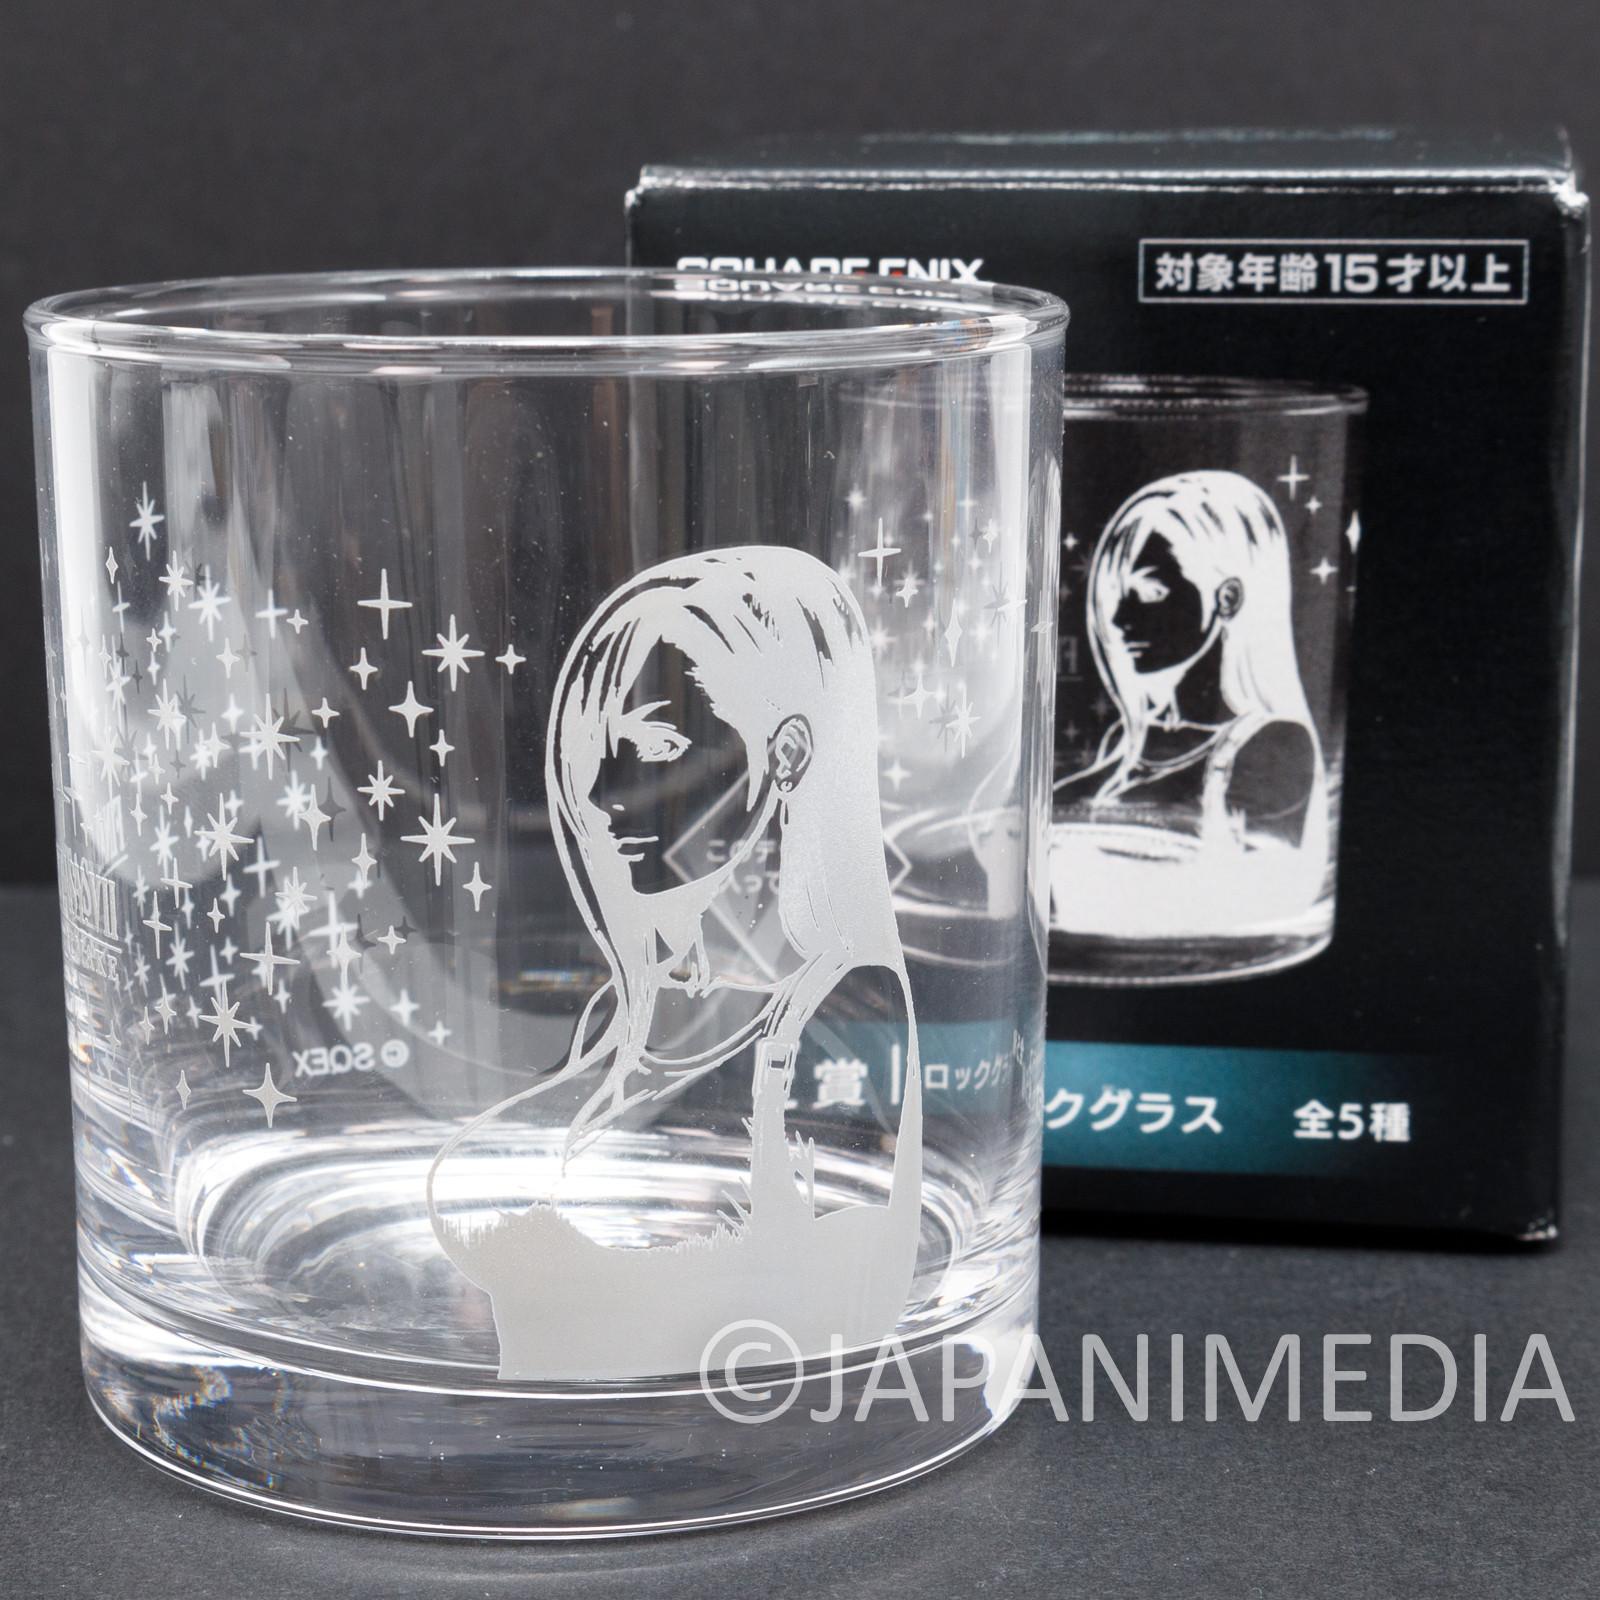 Final Fantasy Tifa Lockhart Rock Glass SQUARE ENIX JAPAN